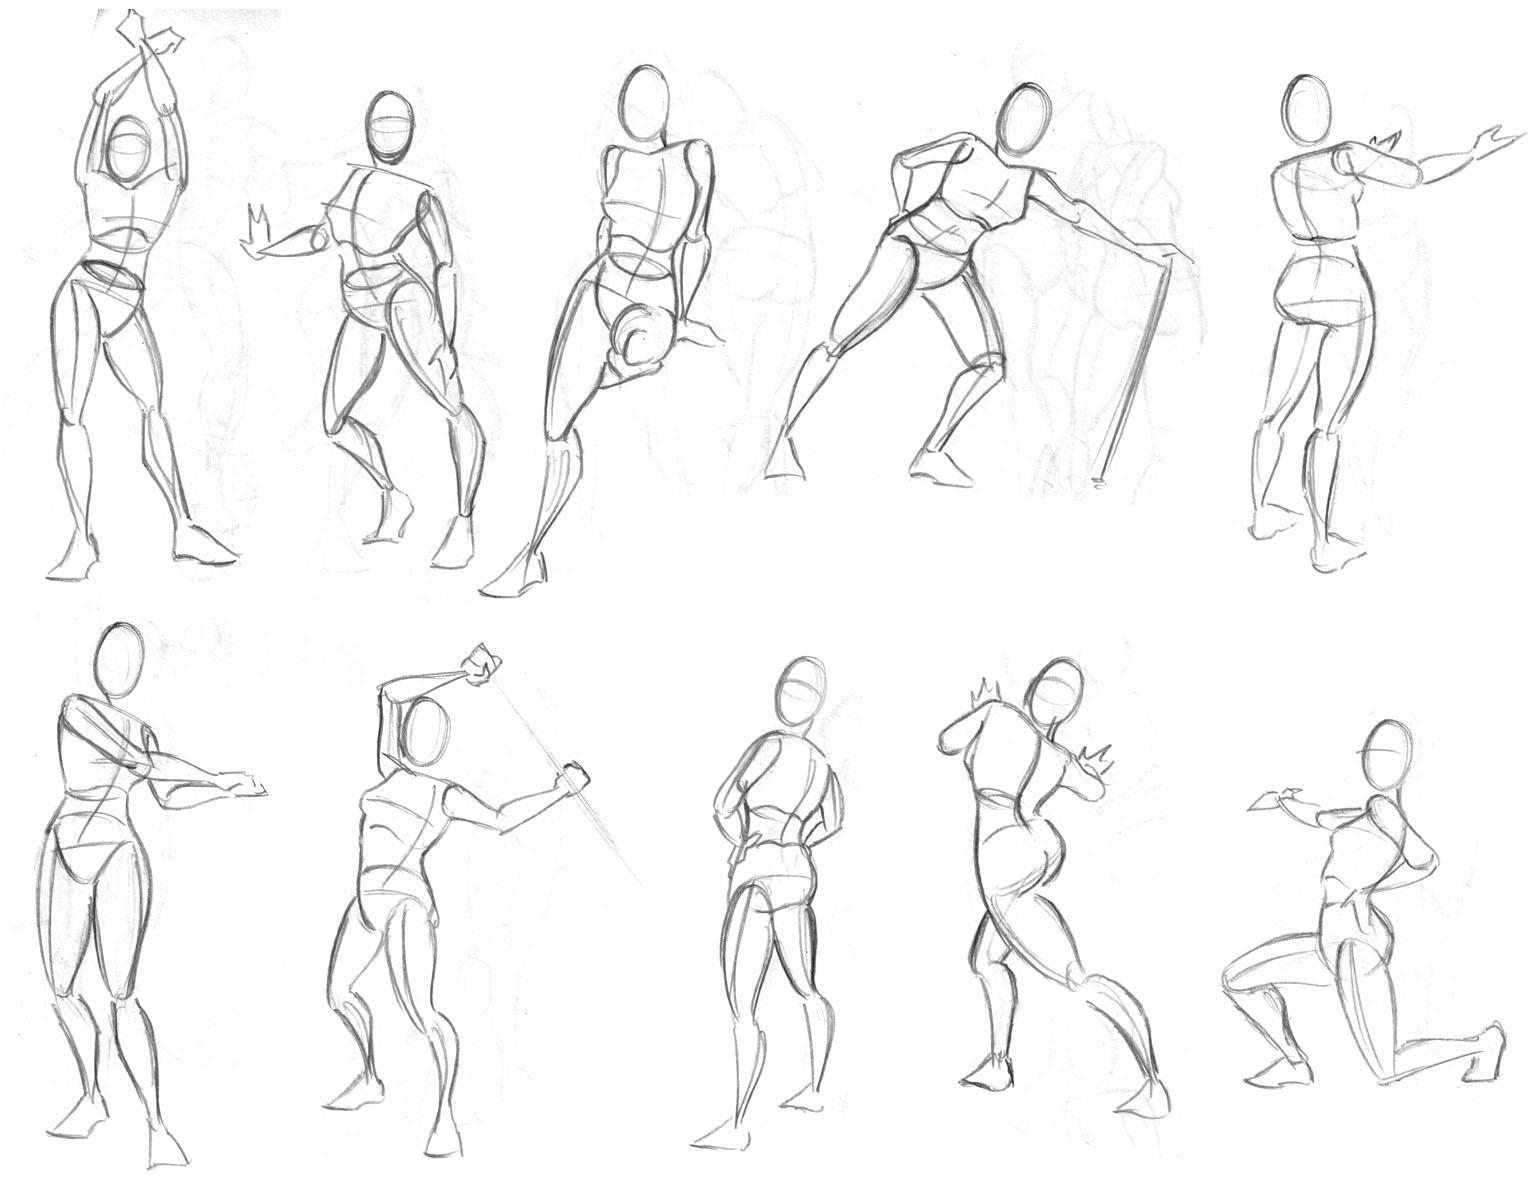 figure - definition - What is ?: what-is-this.net/en/define/figure